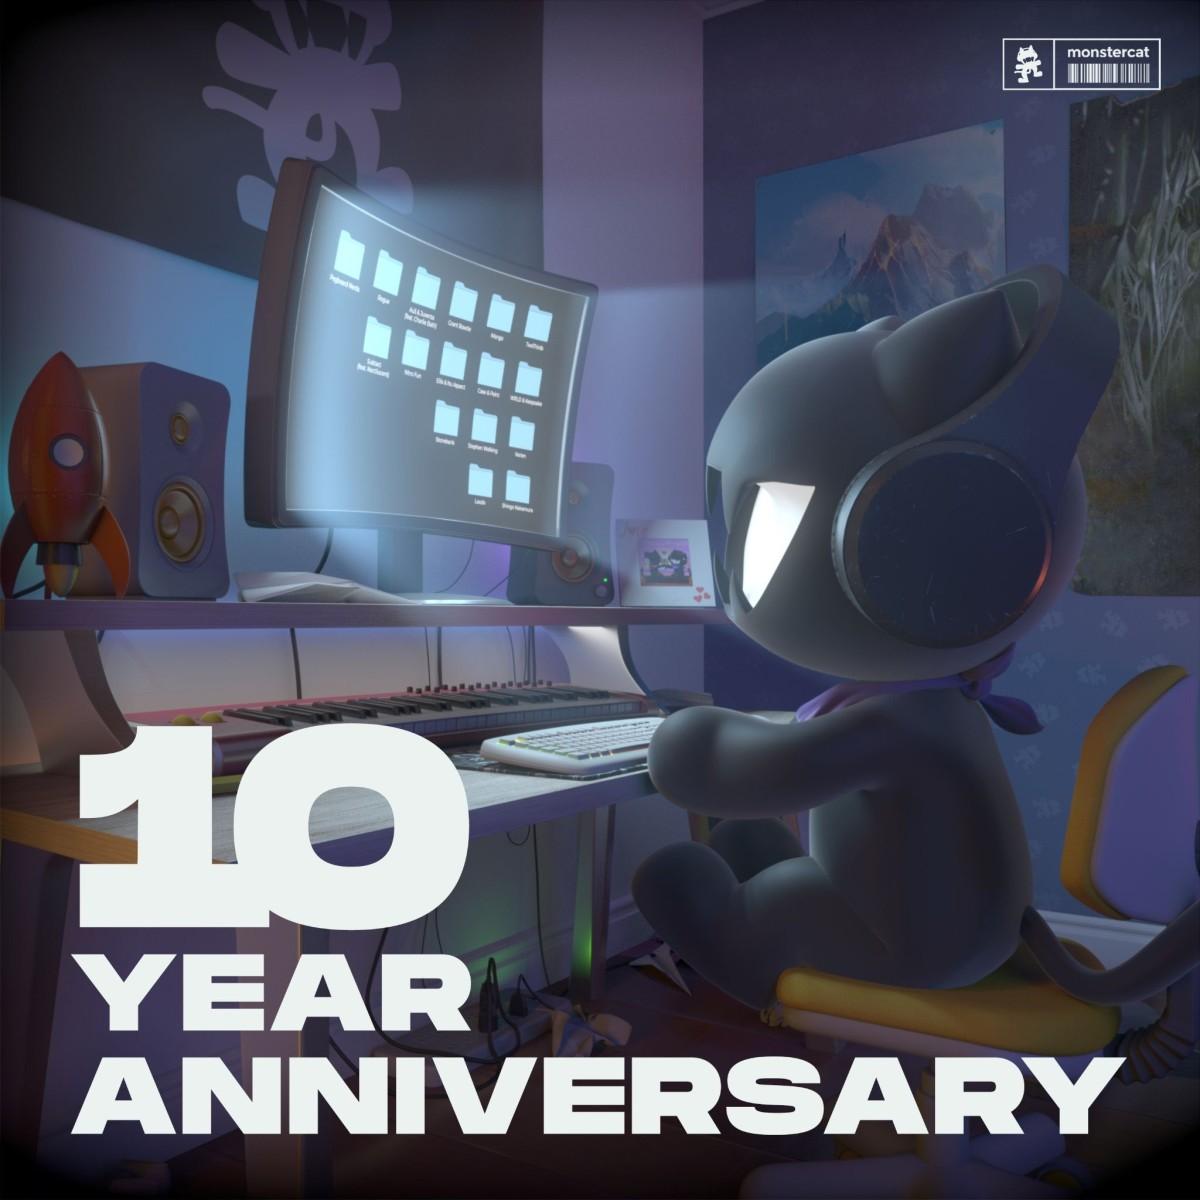 Album artwork for Monstercat's 10 Year Anniversary compilation.